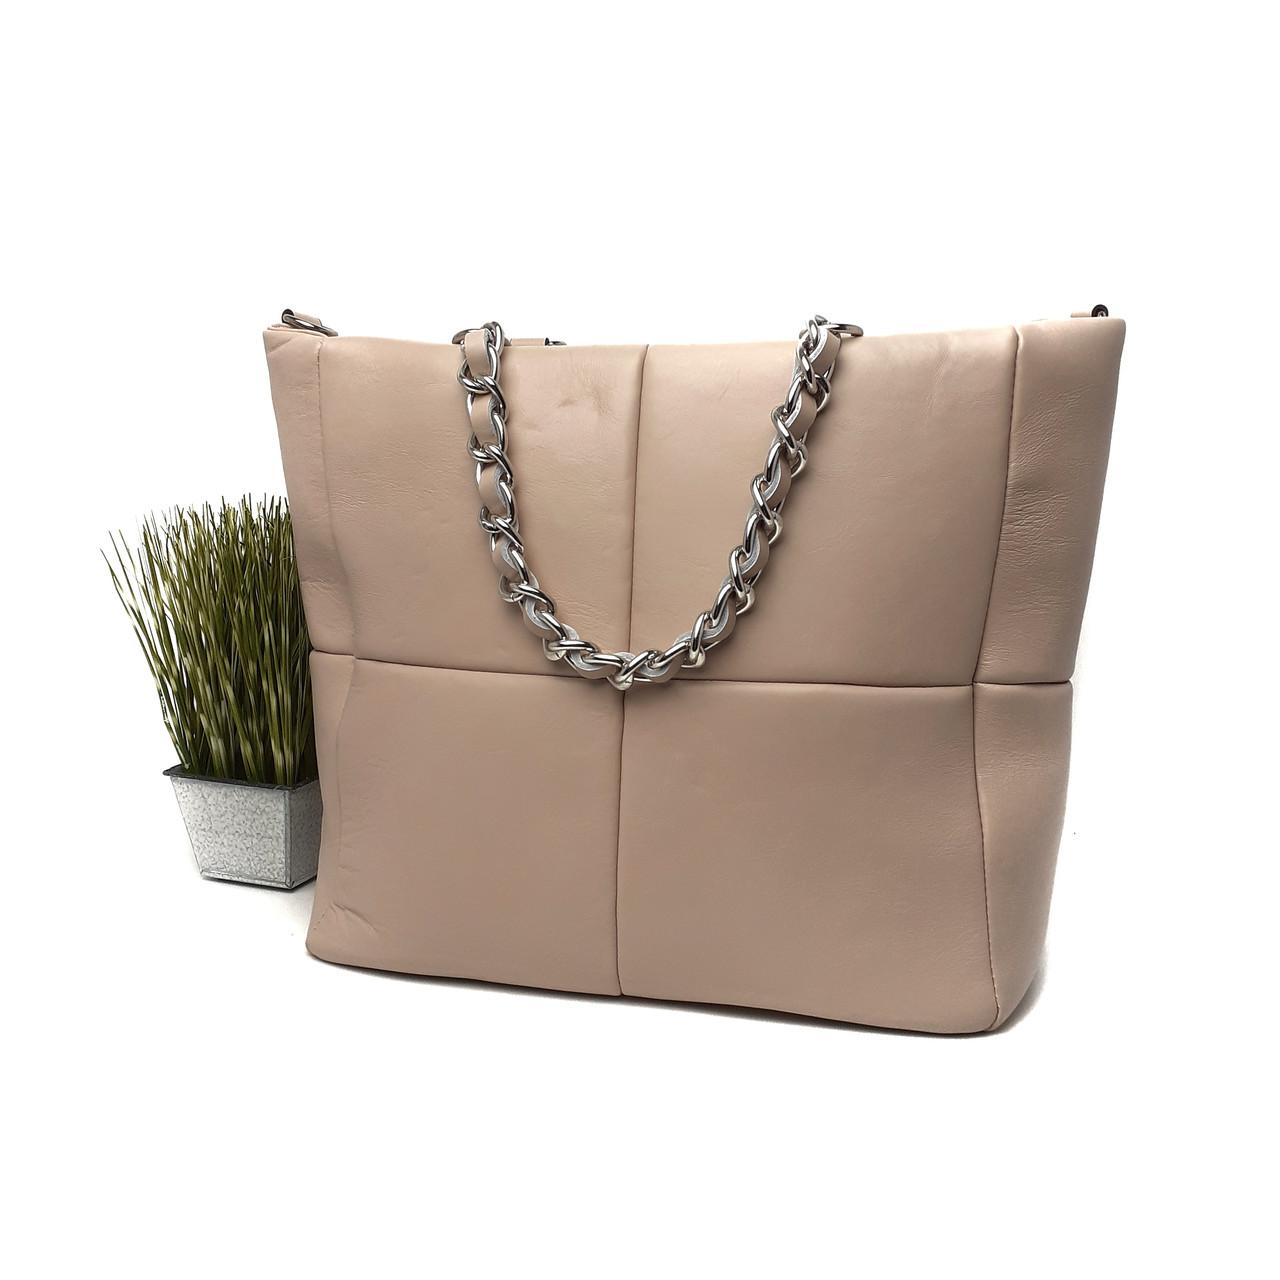 Жіноча сумка новинка квадратами Арт.4135 ( BB) V. P. Італія